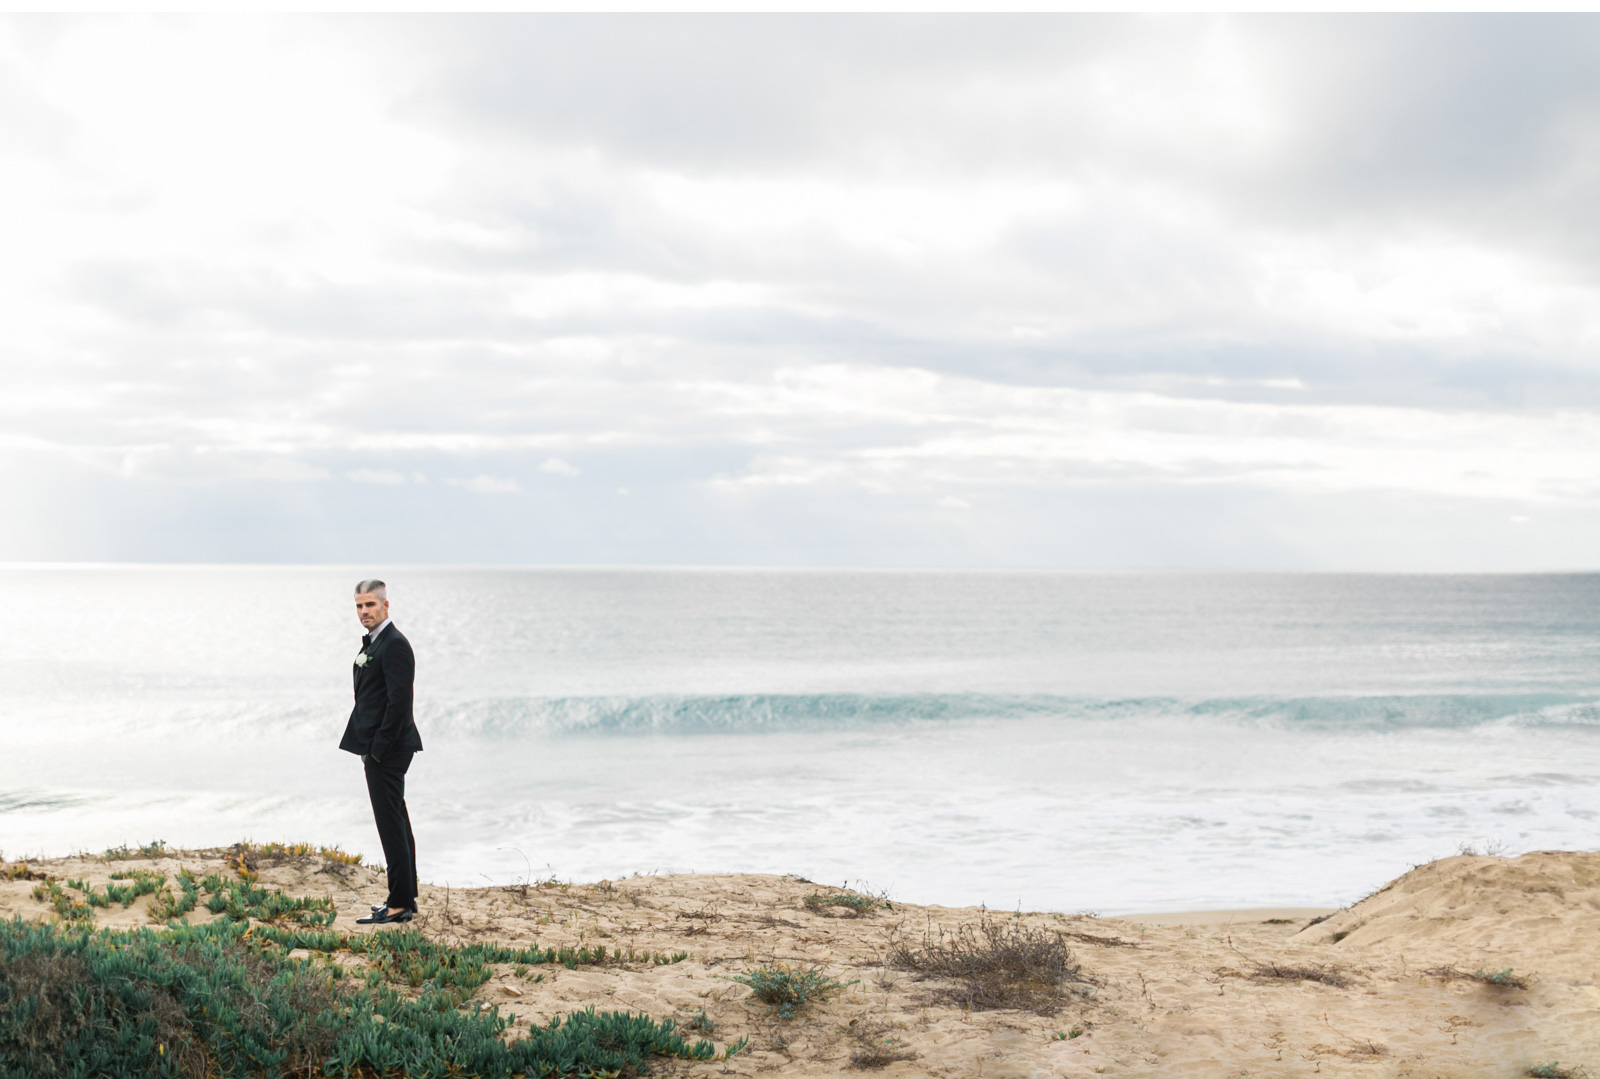 Malibu-First-Look-Natalie-Schutt-Photography-Rod-Brewster_01.jpg